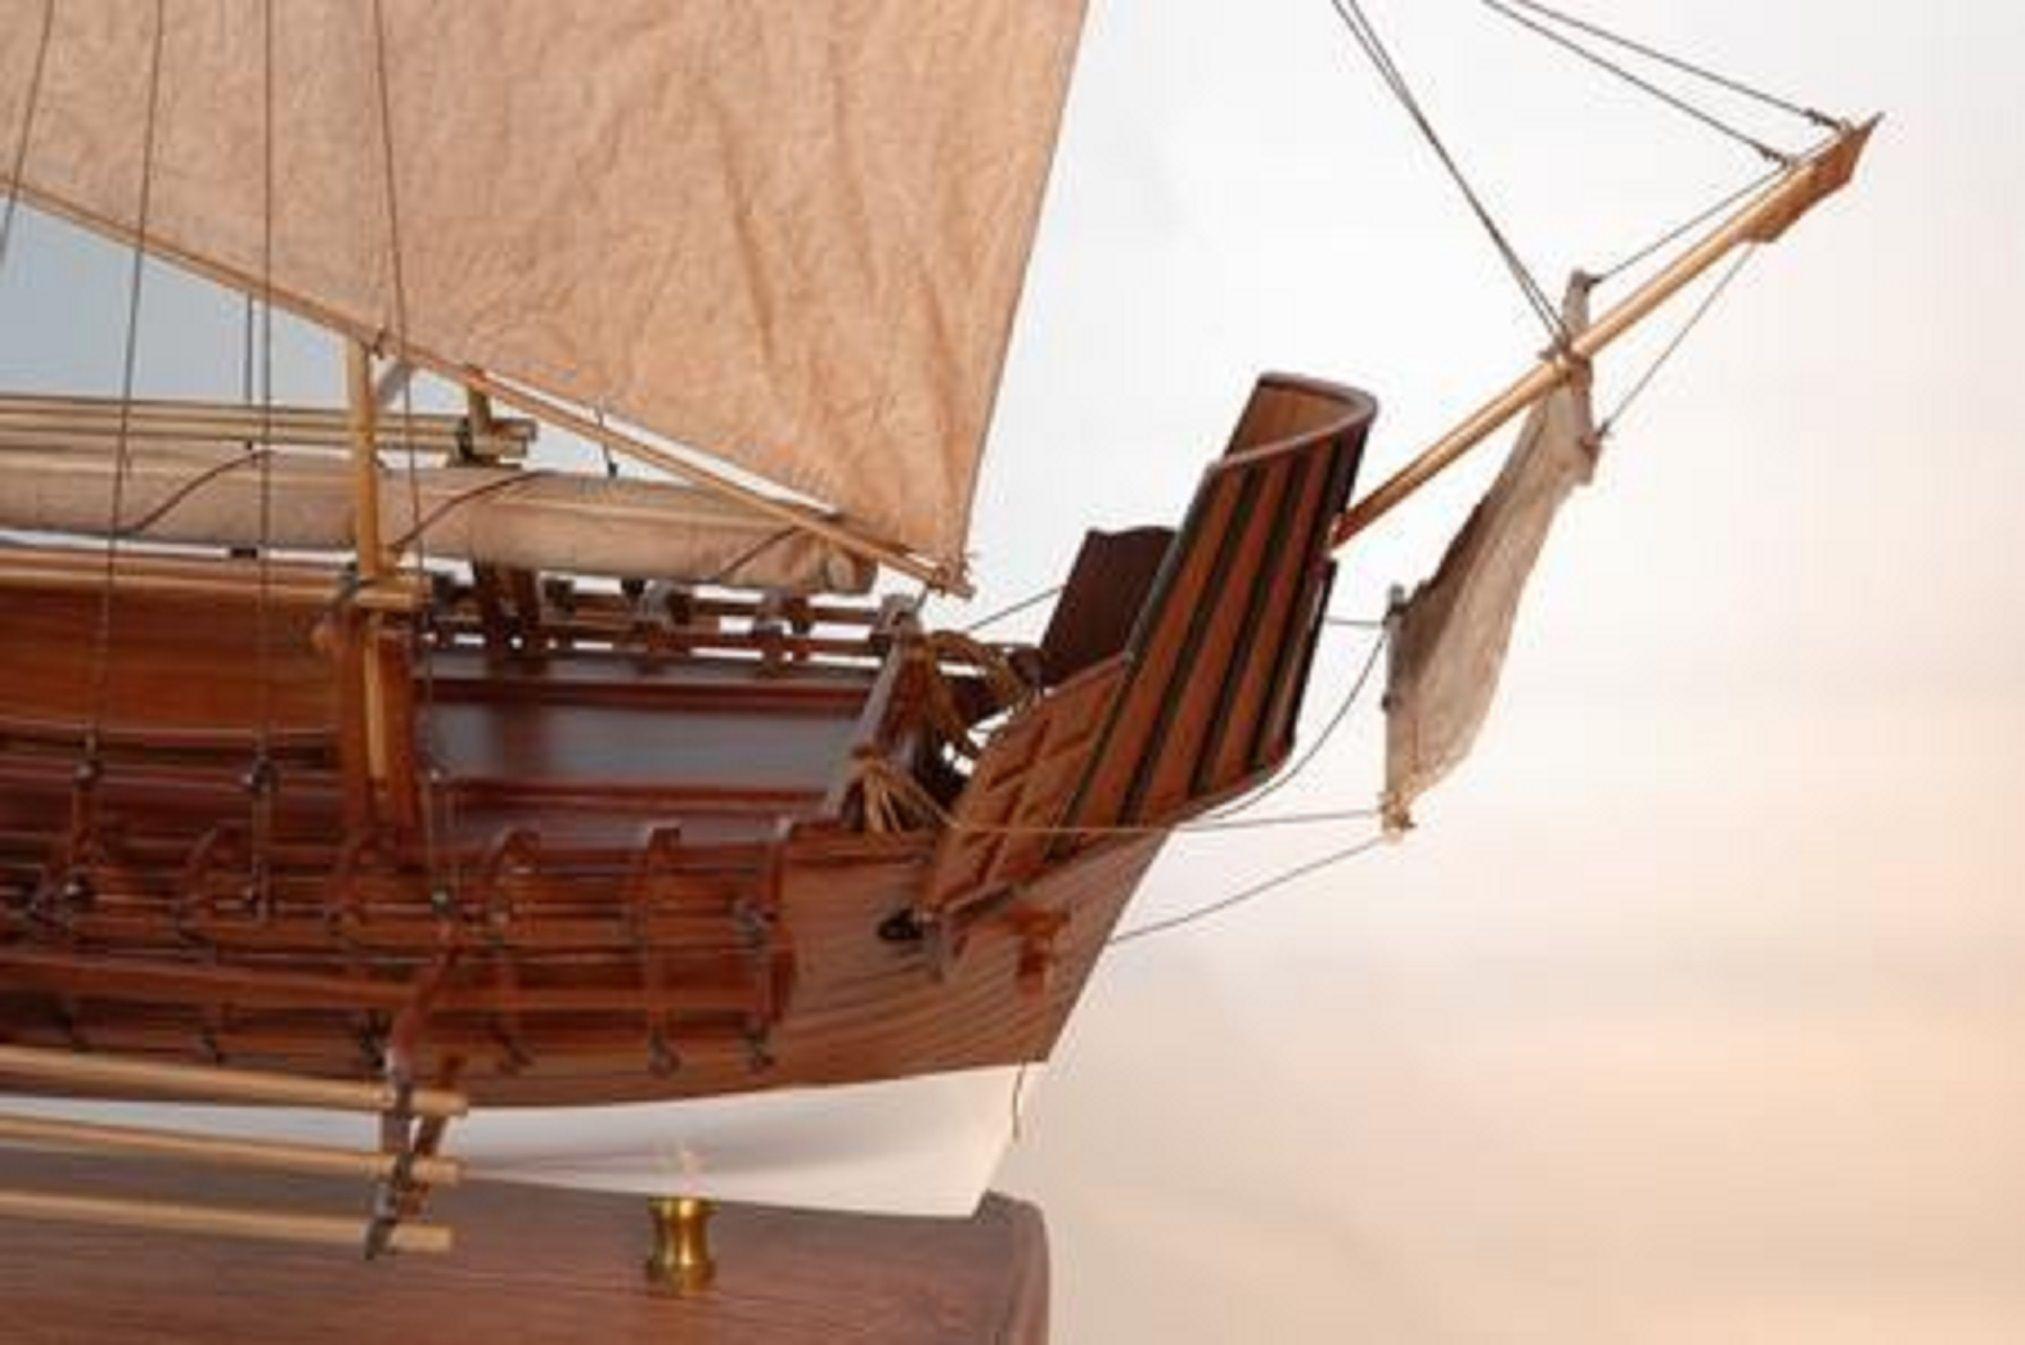 229-6981-Borobudur-model-ship-Premier-Range